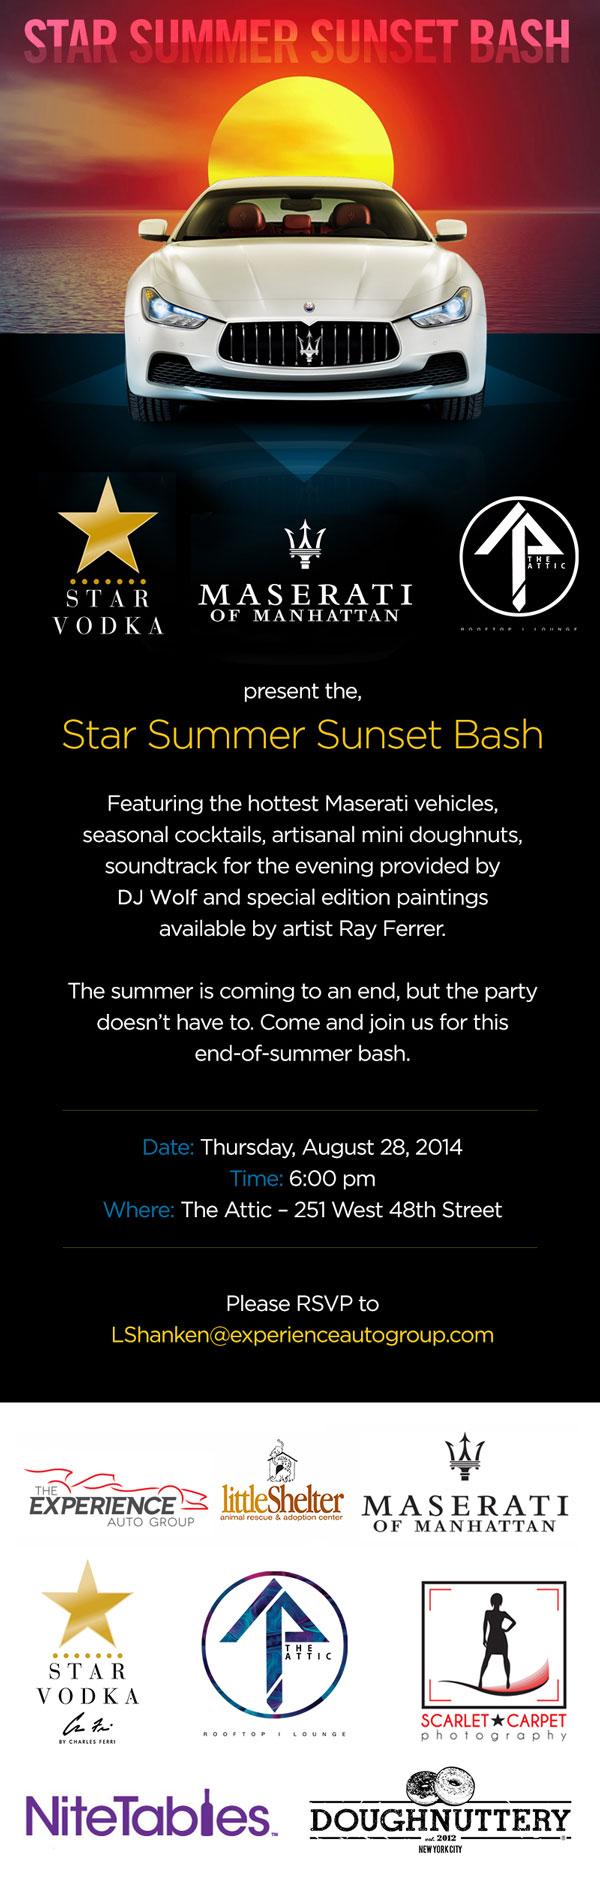 Manhattan Maserati Presents Star Summer Sunset Bash @ Maserati of Manhattan | New York | New York | United States